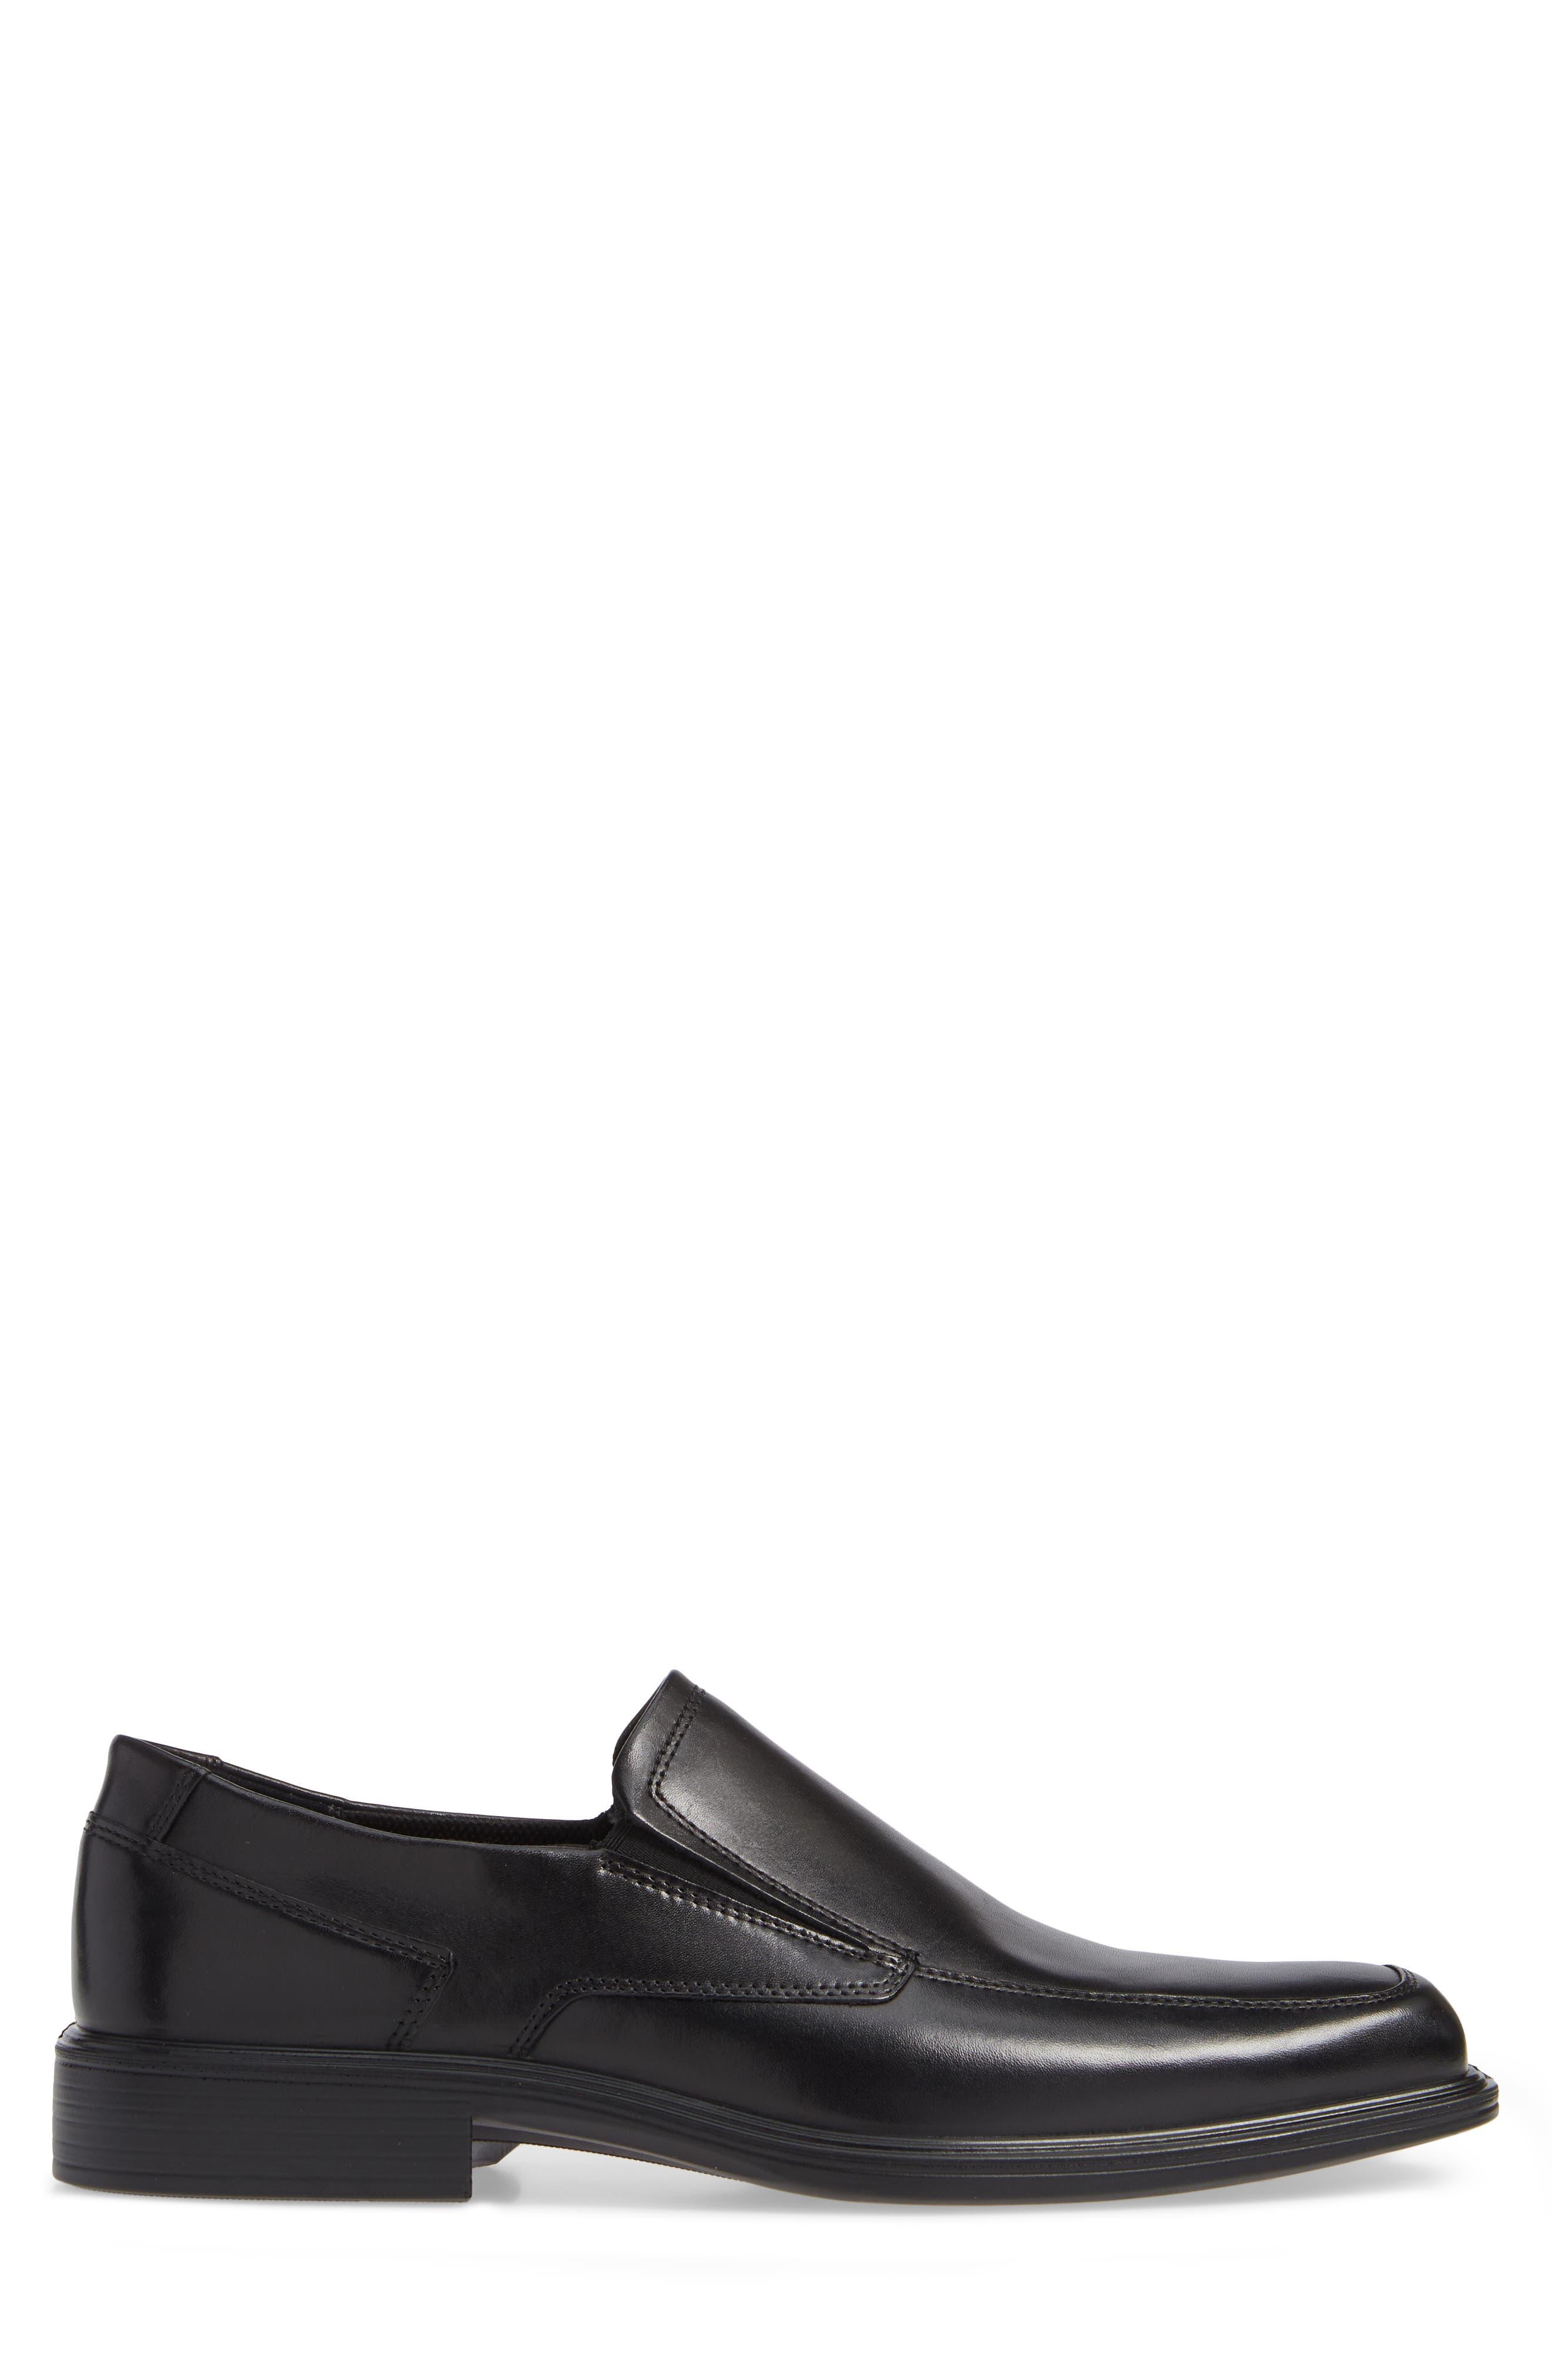 ECCO, Minneapolis Venetian Loafer, Alternate thumbnail 3, color, BLACK/BLACK LEATHER